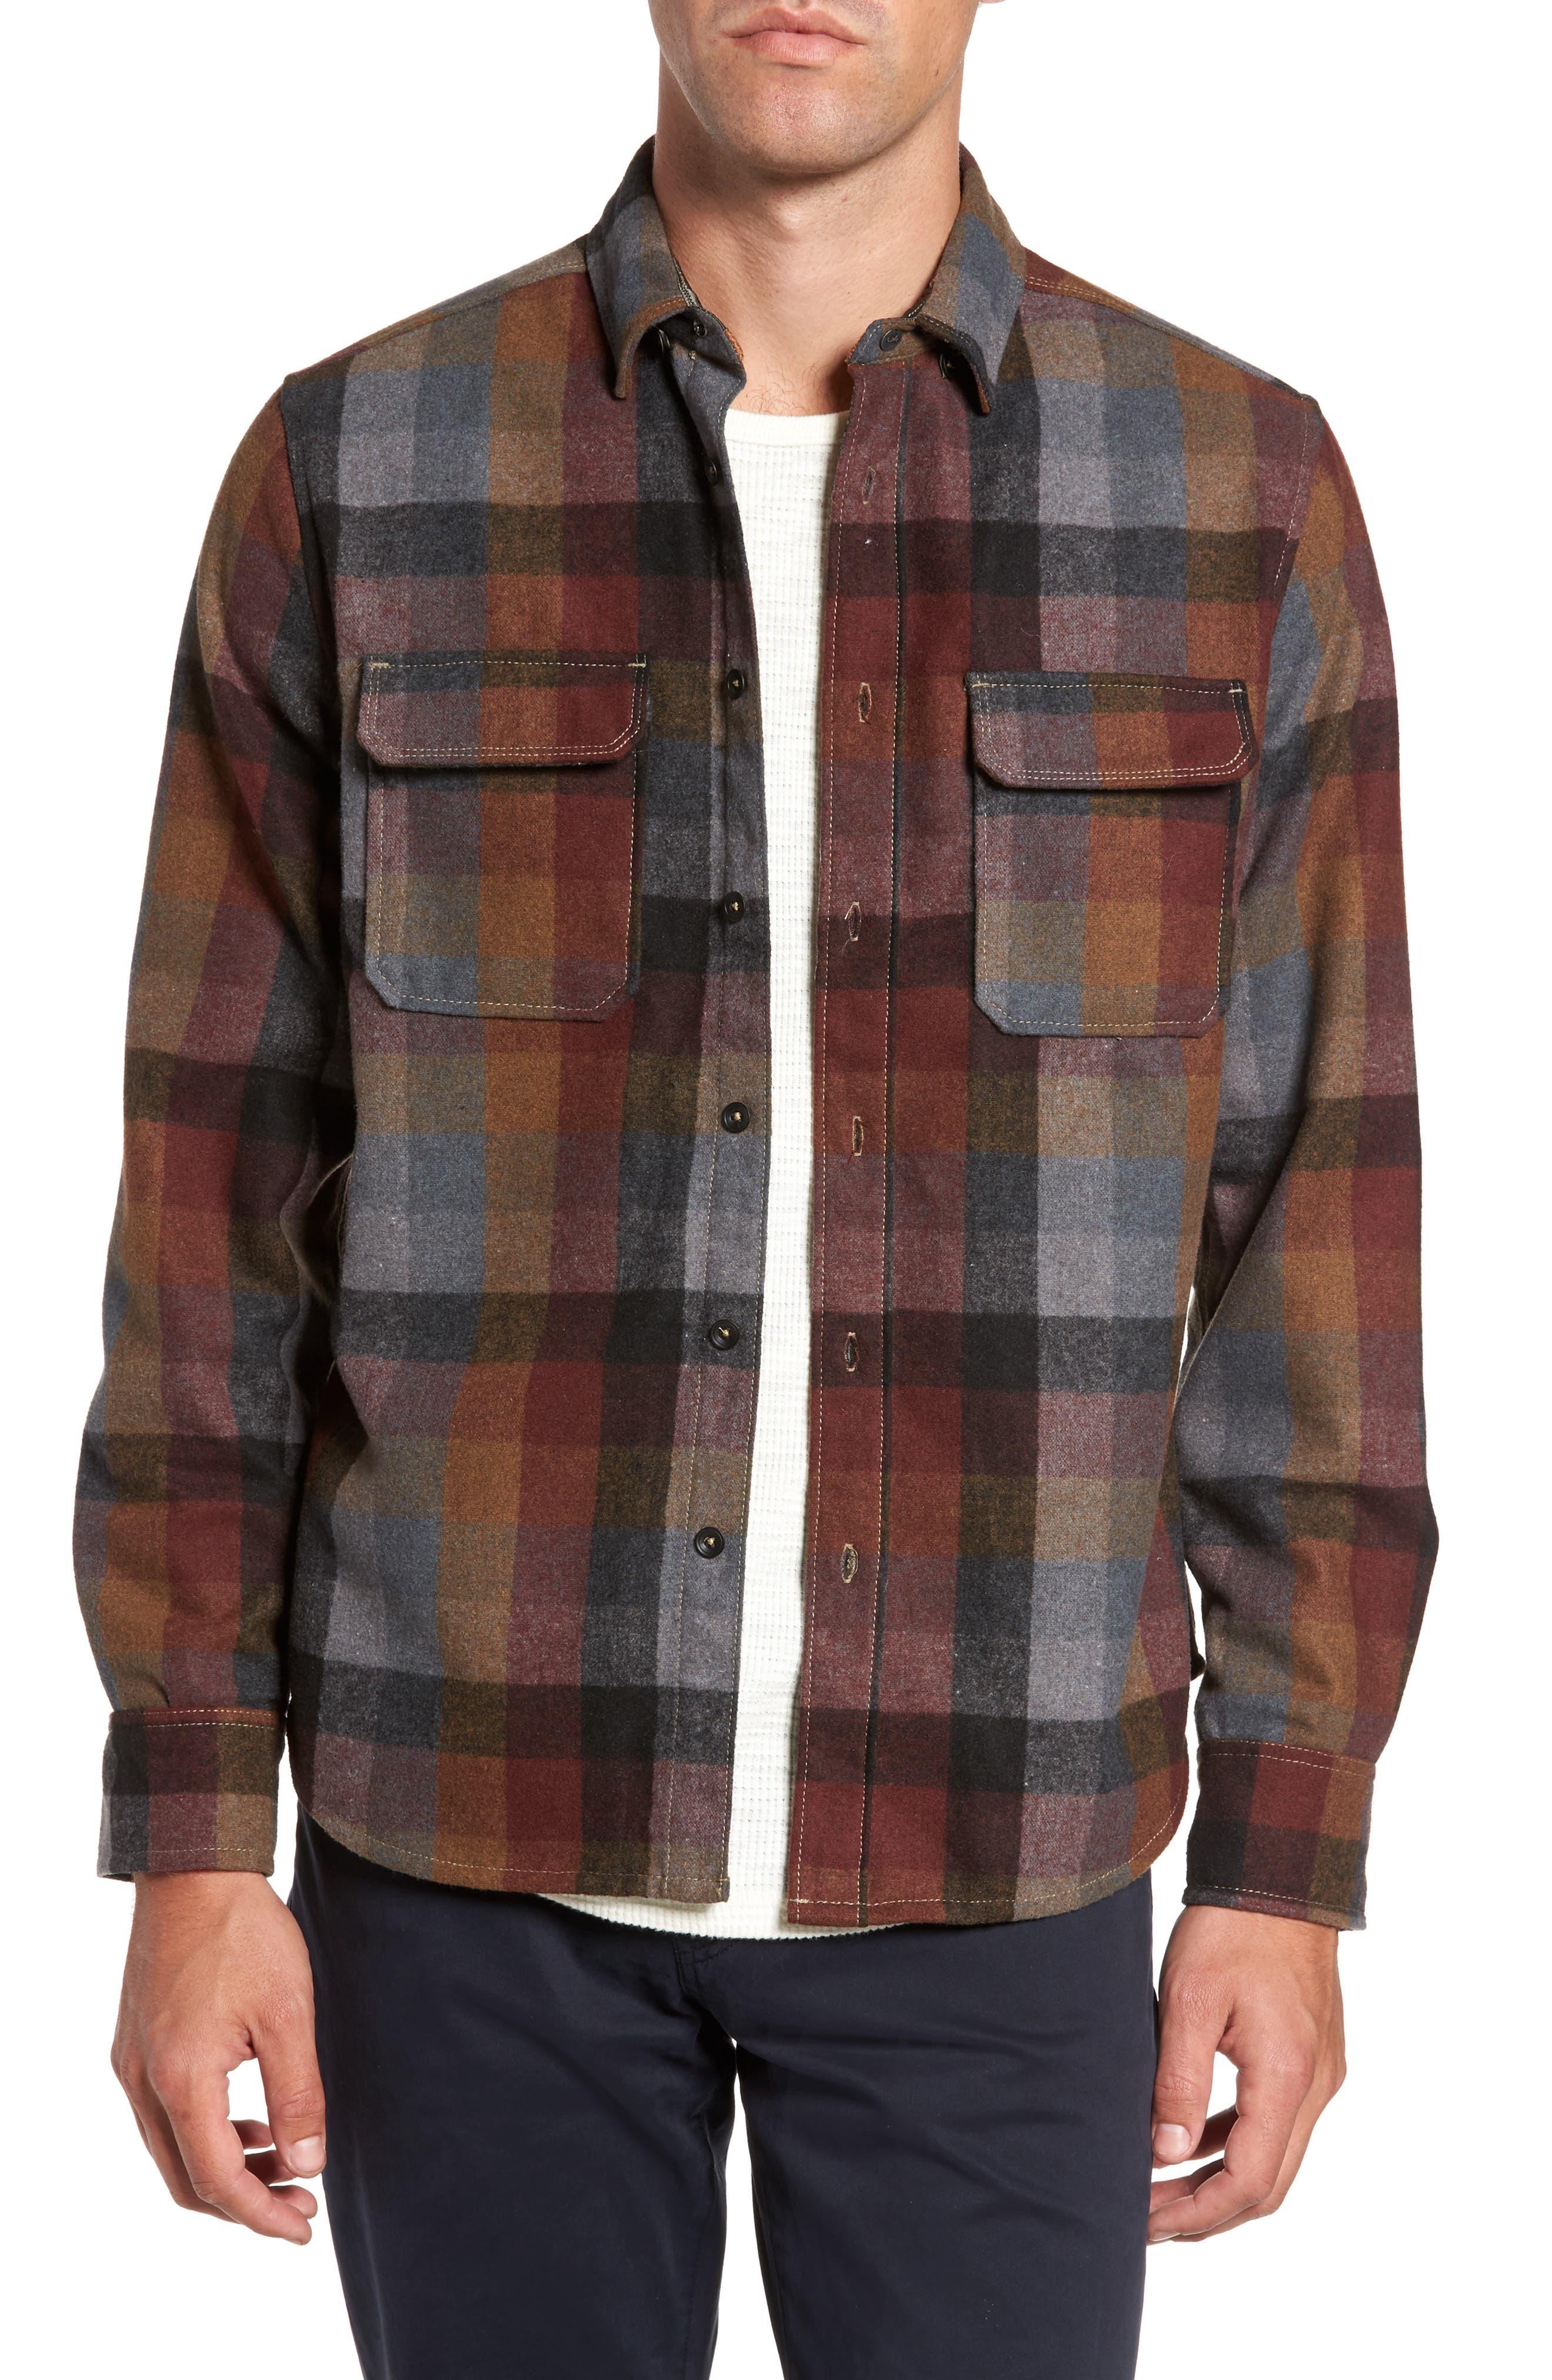 Heath Brushed Flannel Shirt,                             Main thumbnail 1, color,                             BURGUNDY